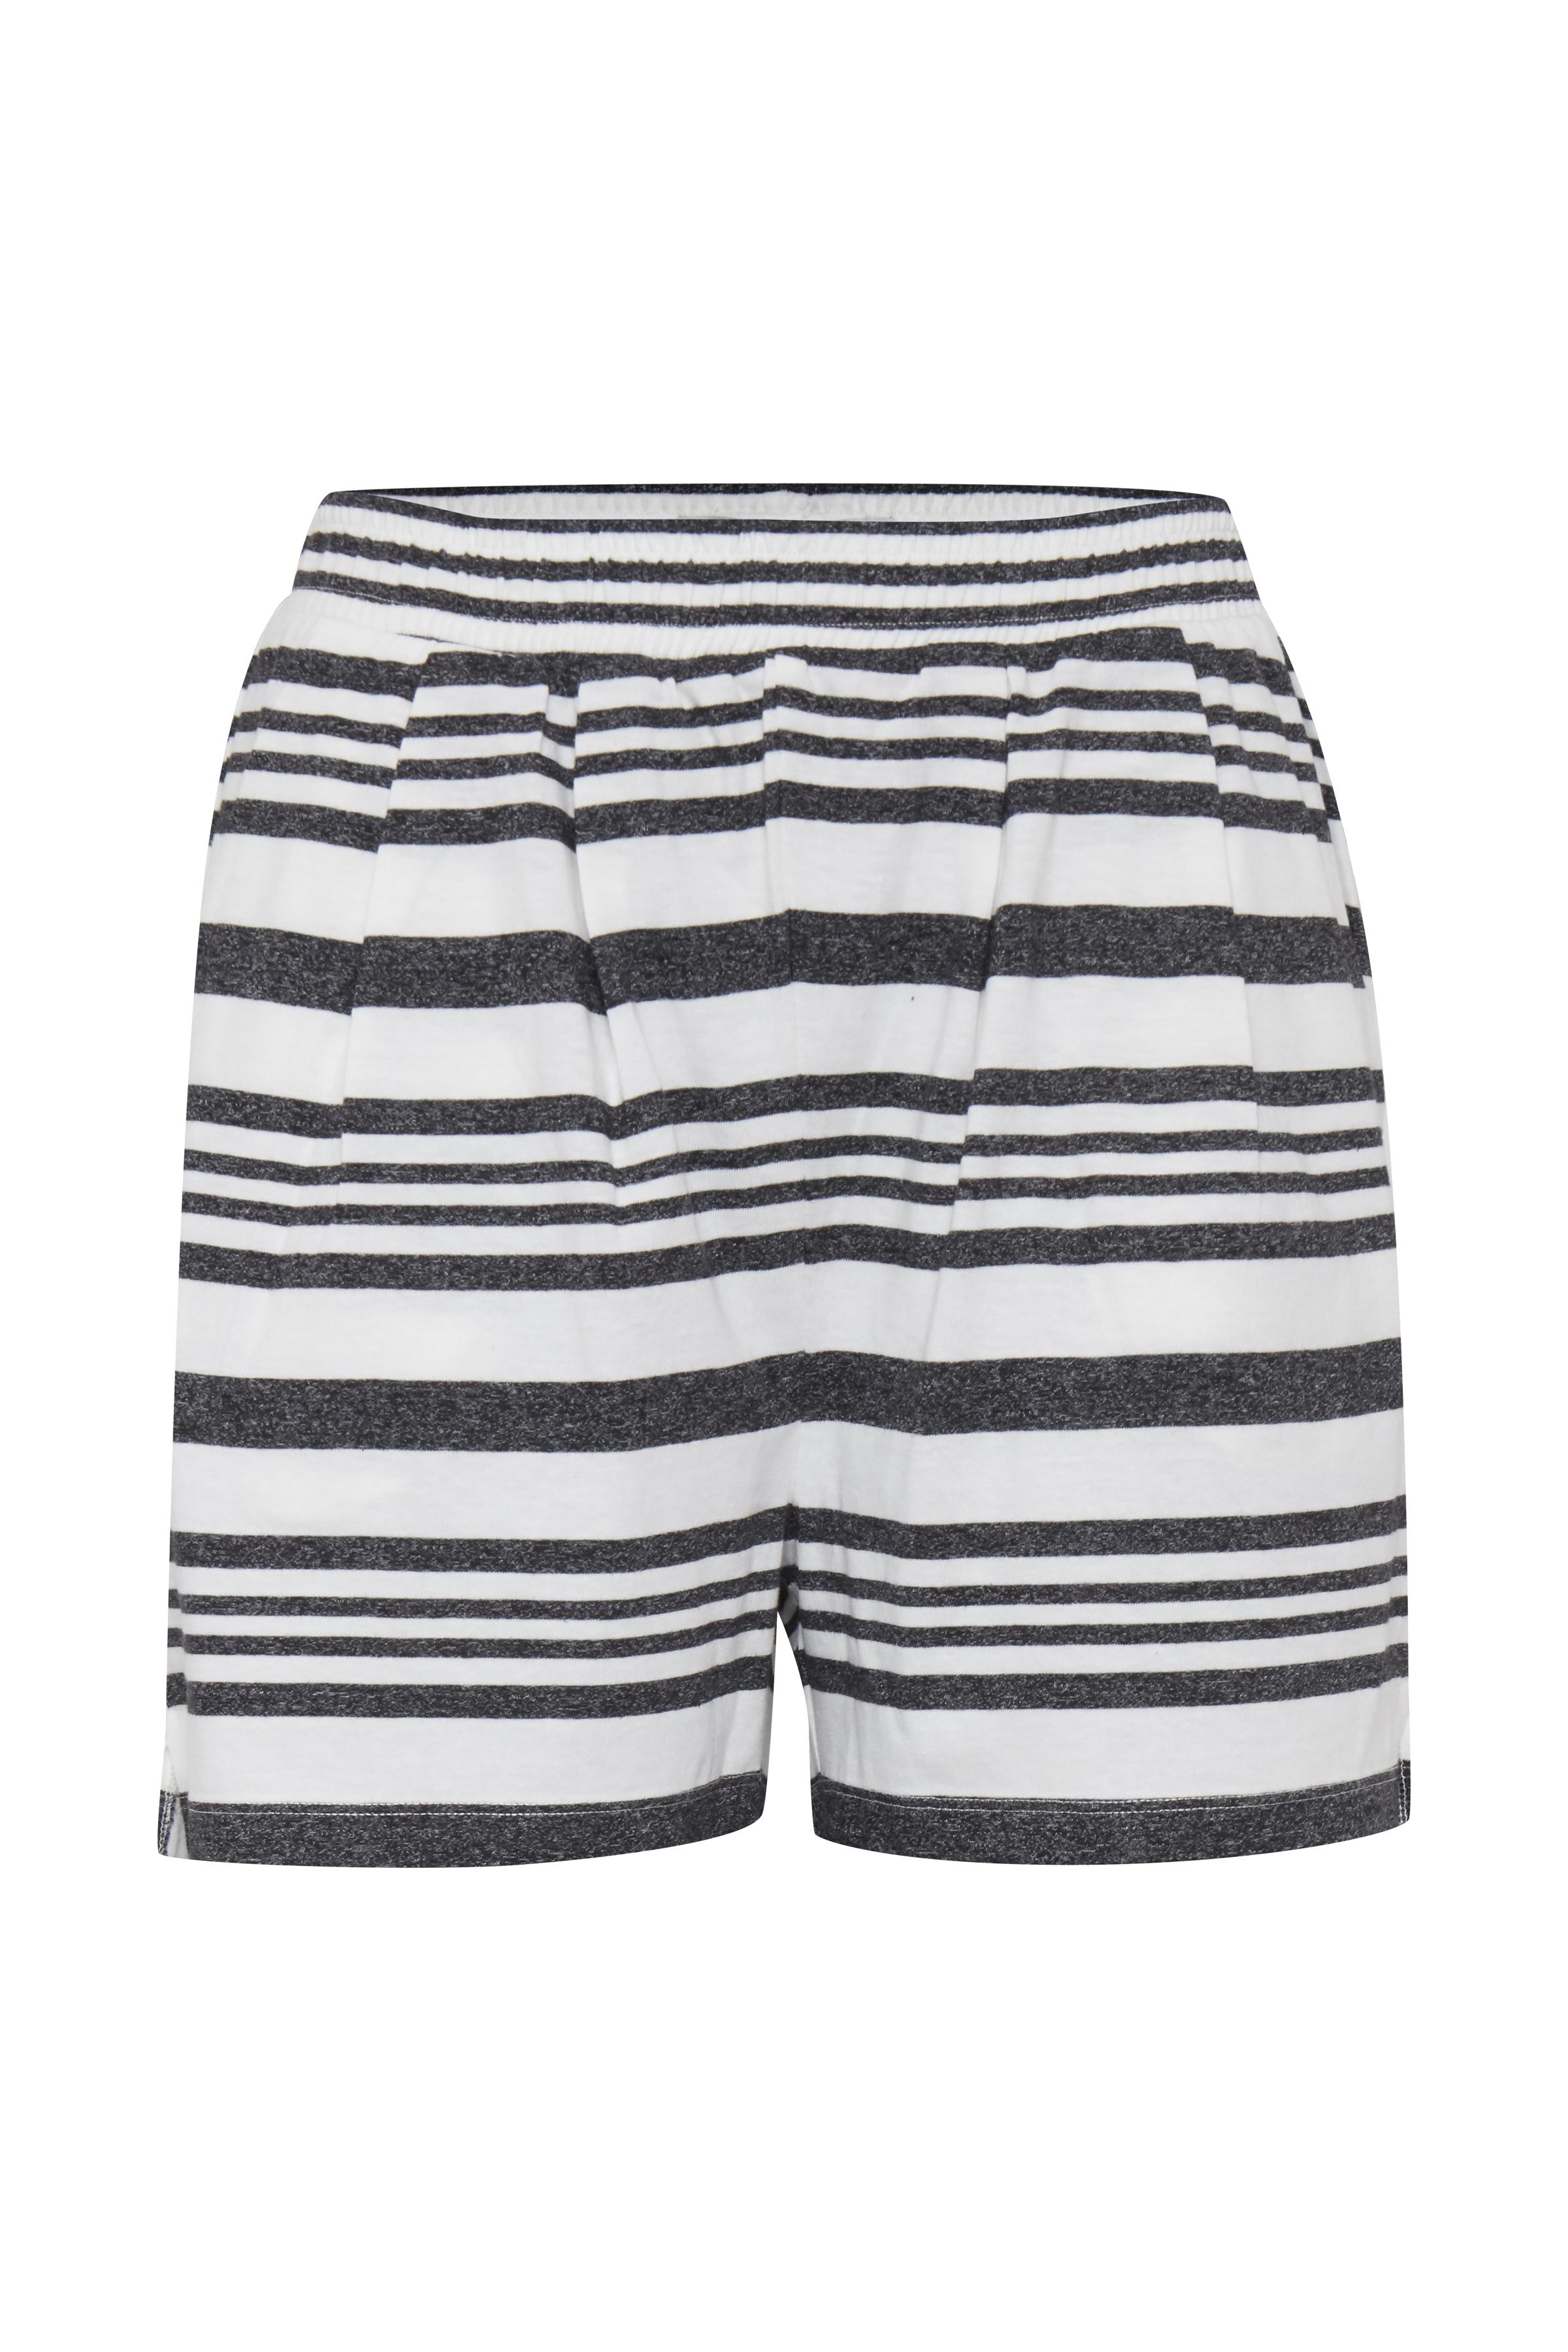 Wide Stripe Black